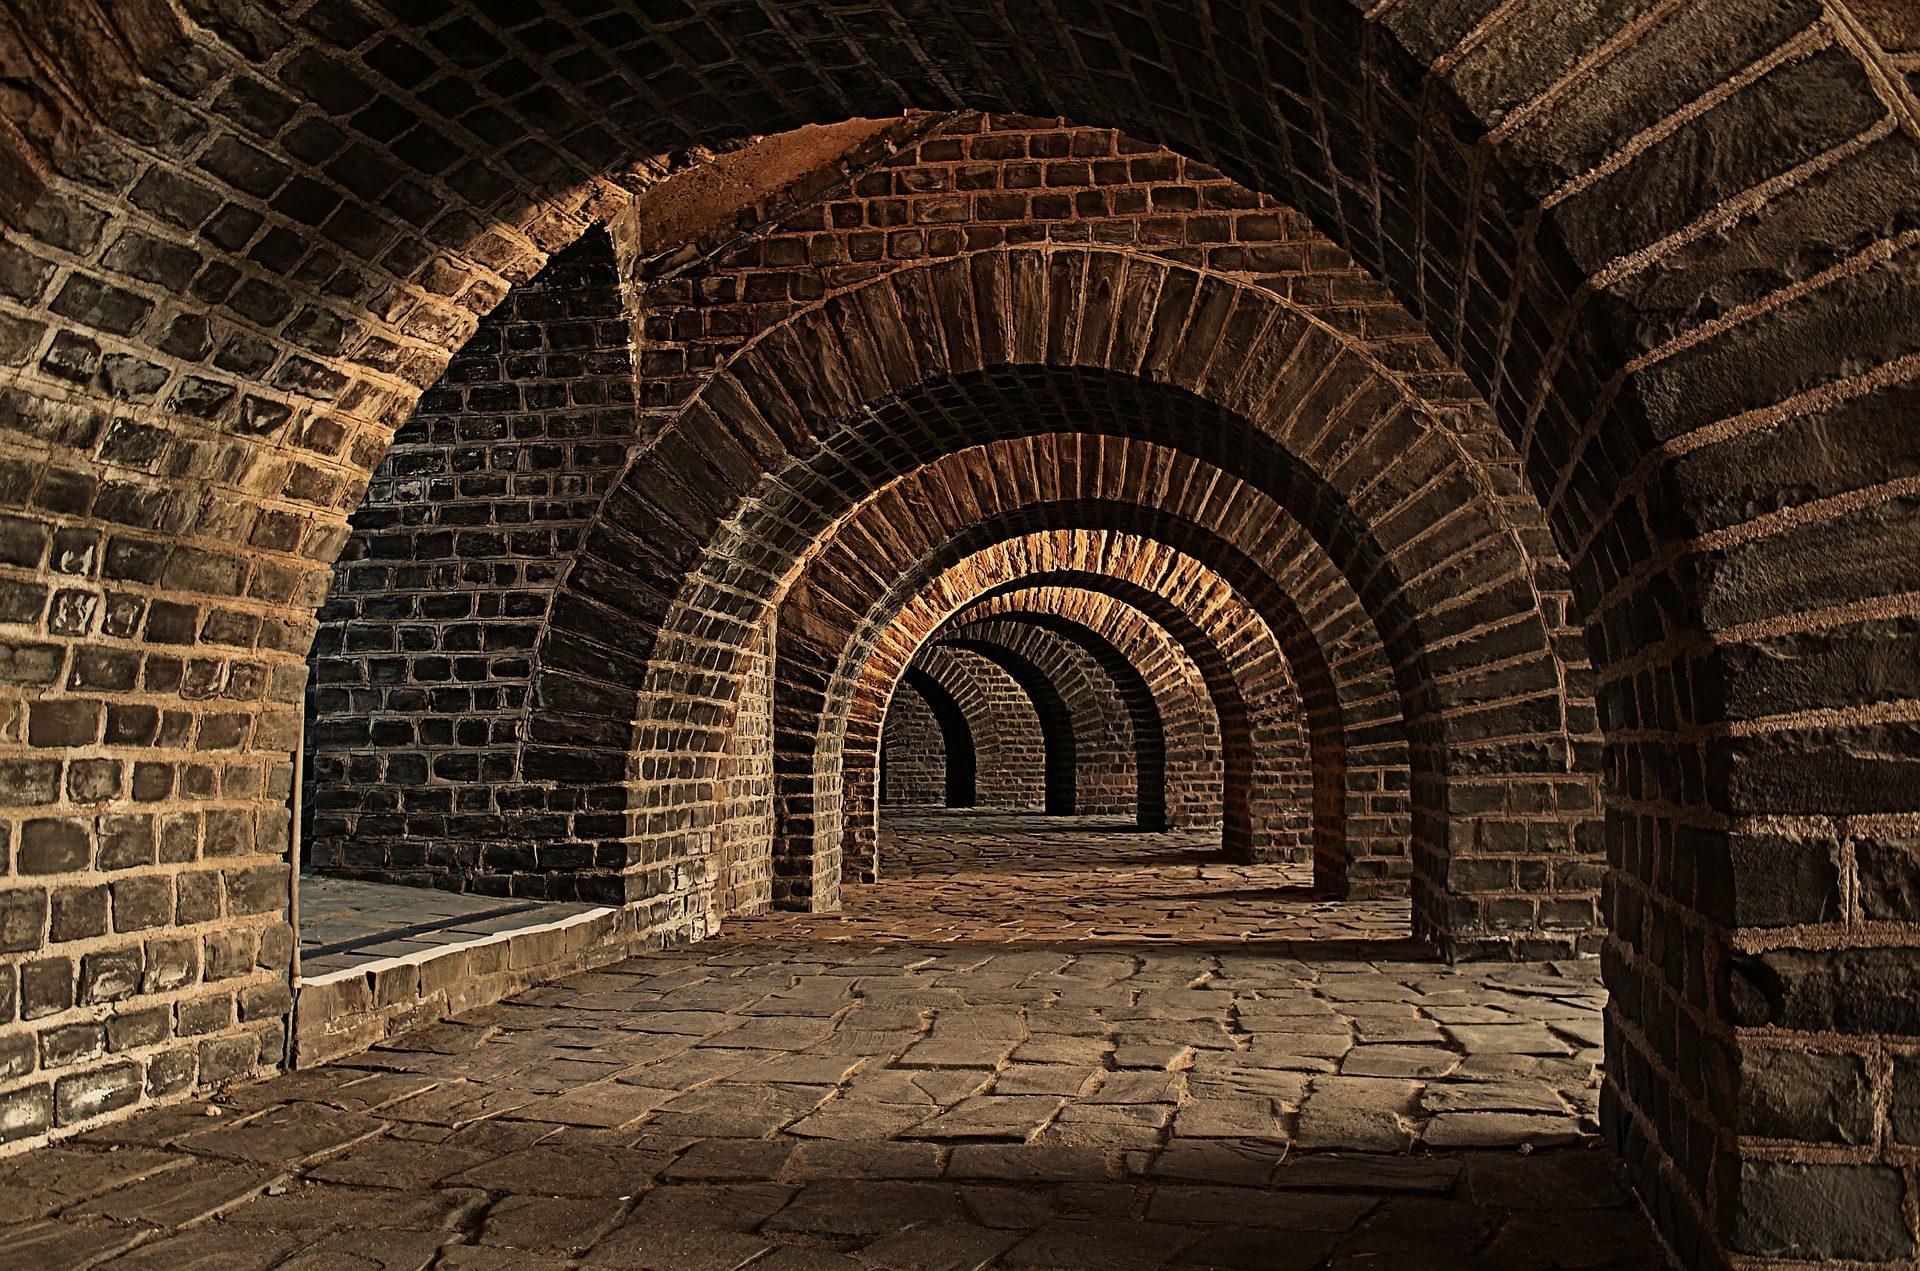 bóvedas, túnel, arcos, ladrillos, keller - Fondos de Pantalla HD - professor-falken.com